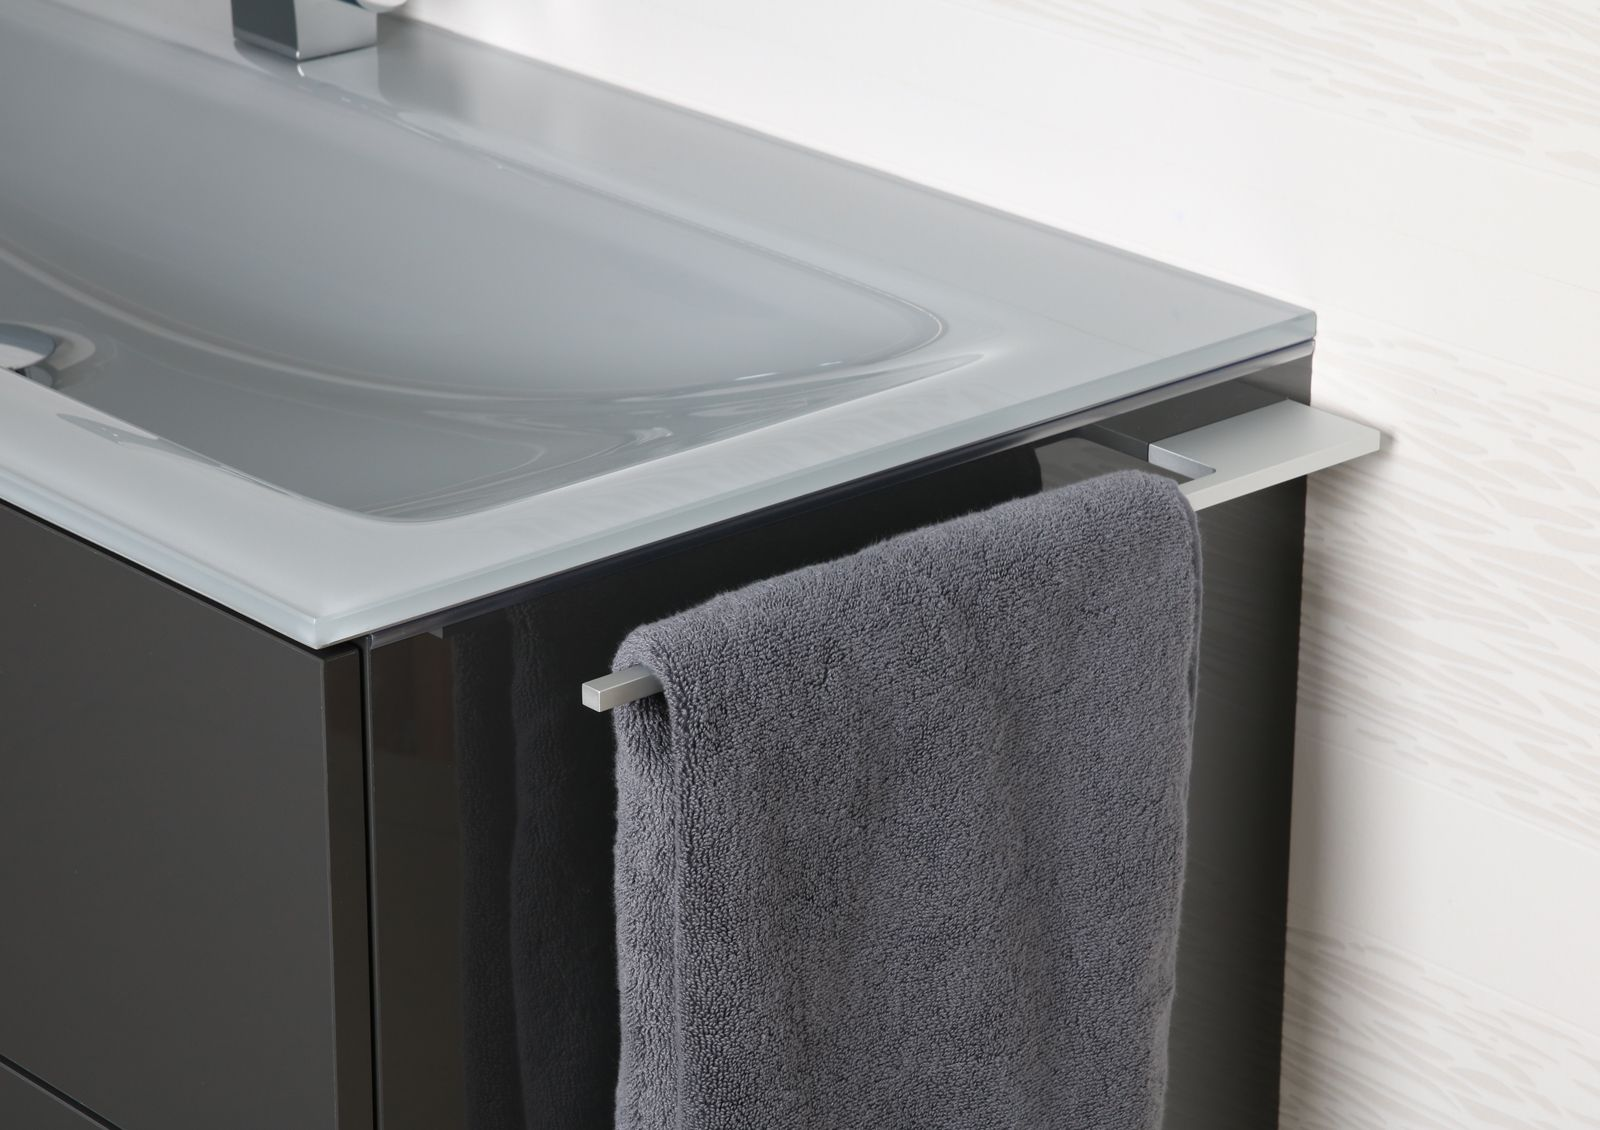 Handtuchhalter Bad Chrom bad accessoires Design